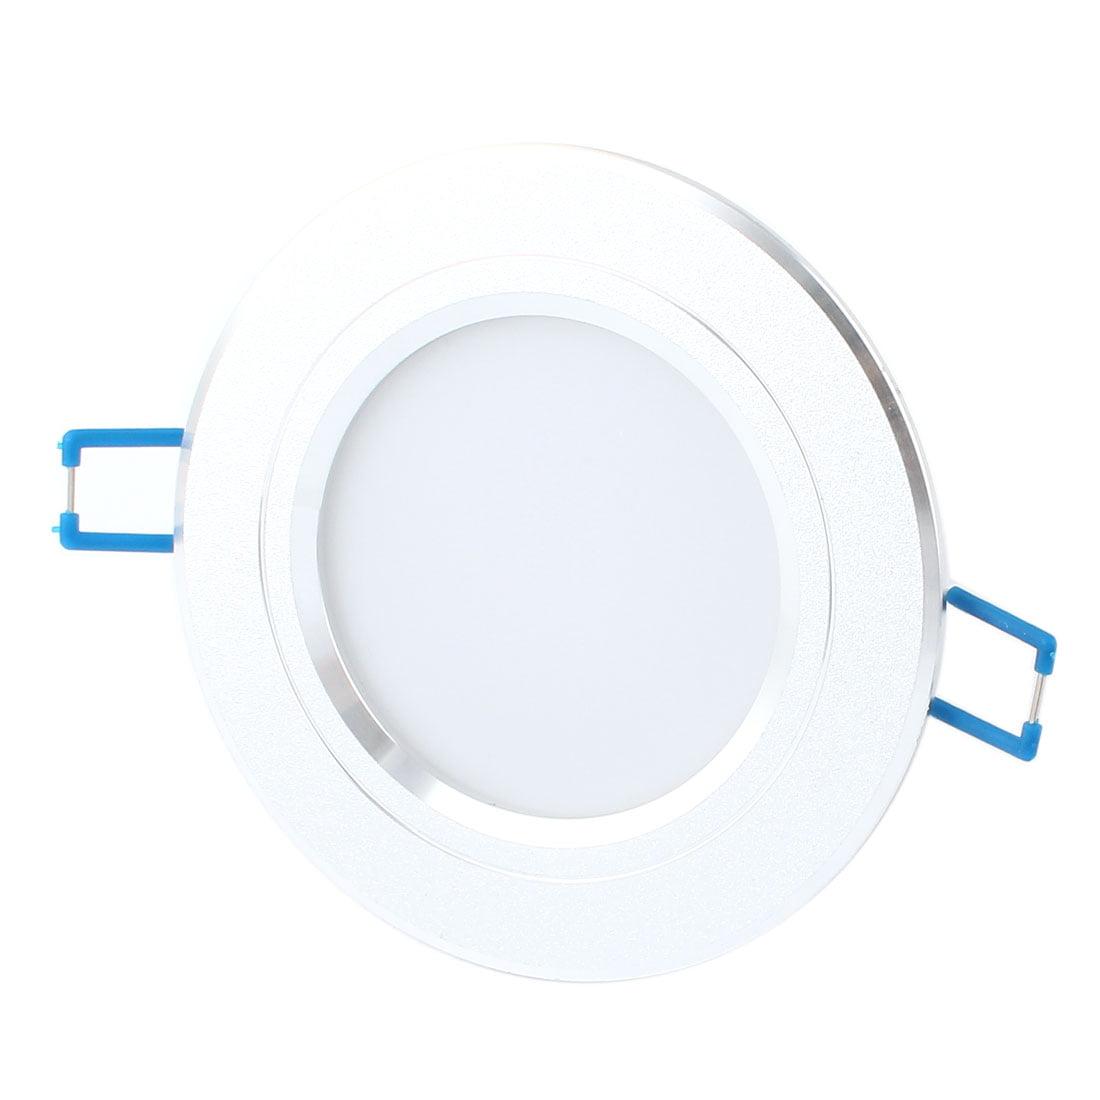 Aluminum Heatsink 5W 3inch Dia Downlight Ceiling Lamp 1032 LED Spot Light Shell